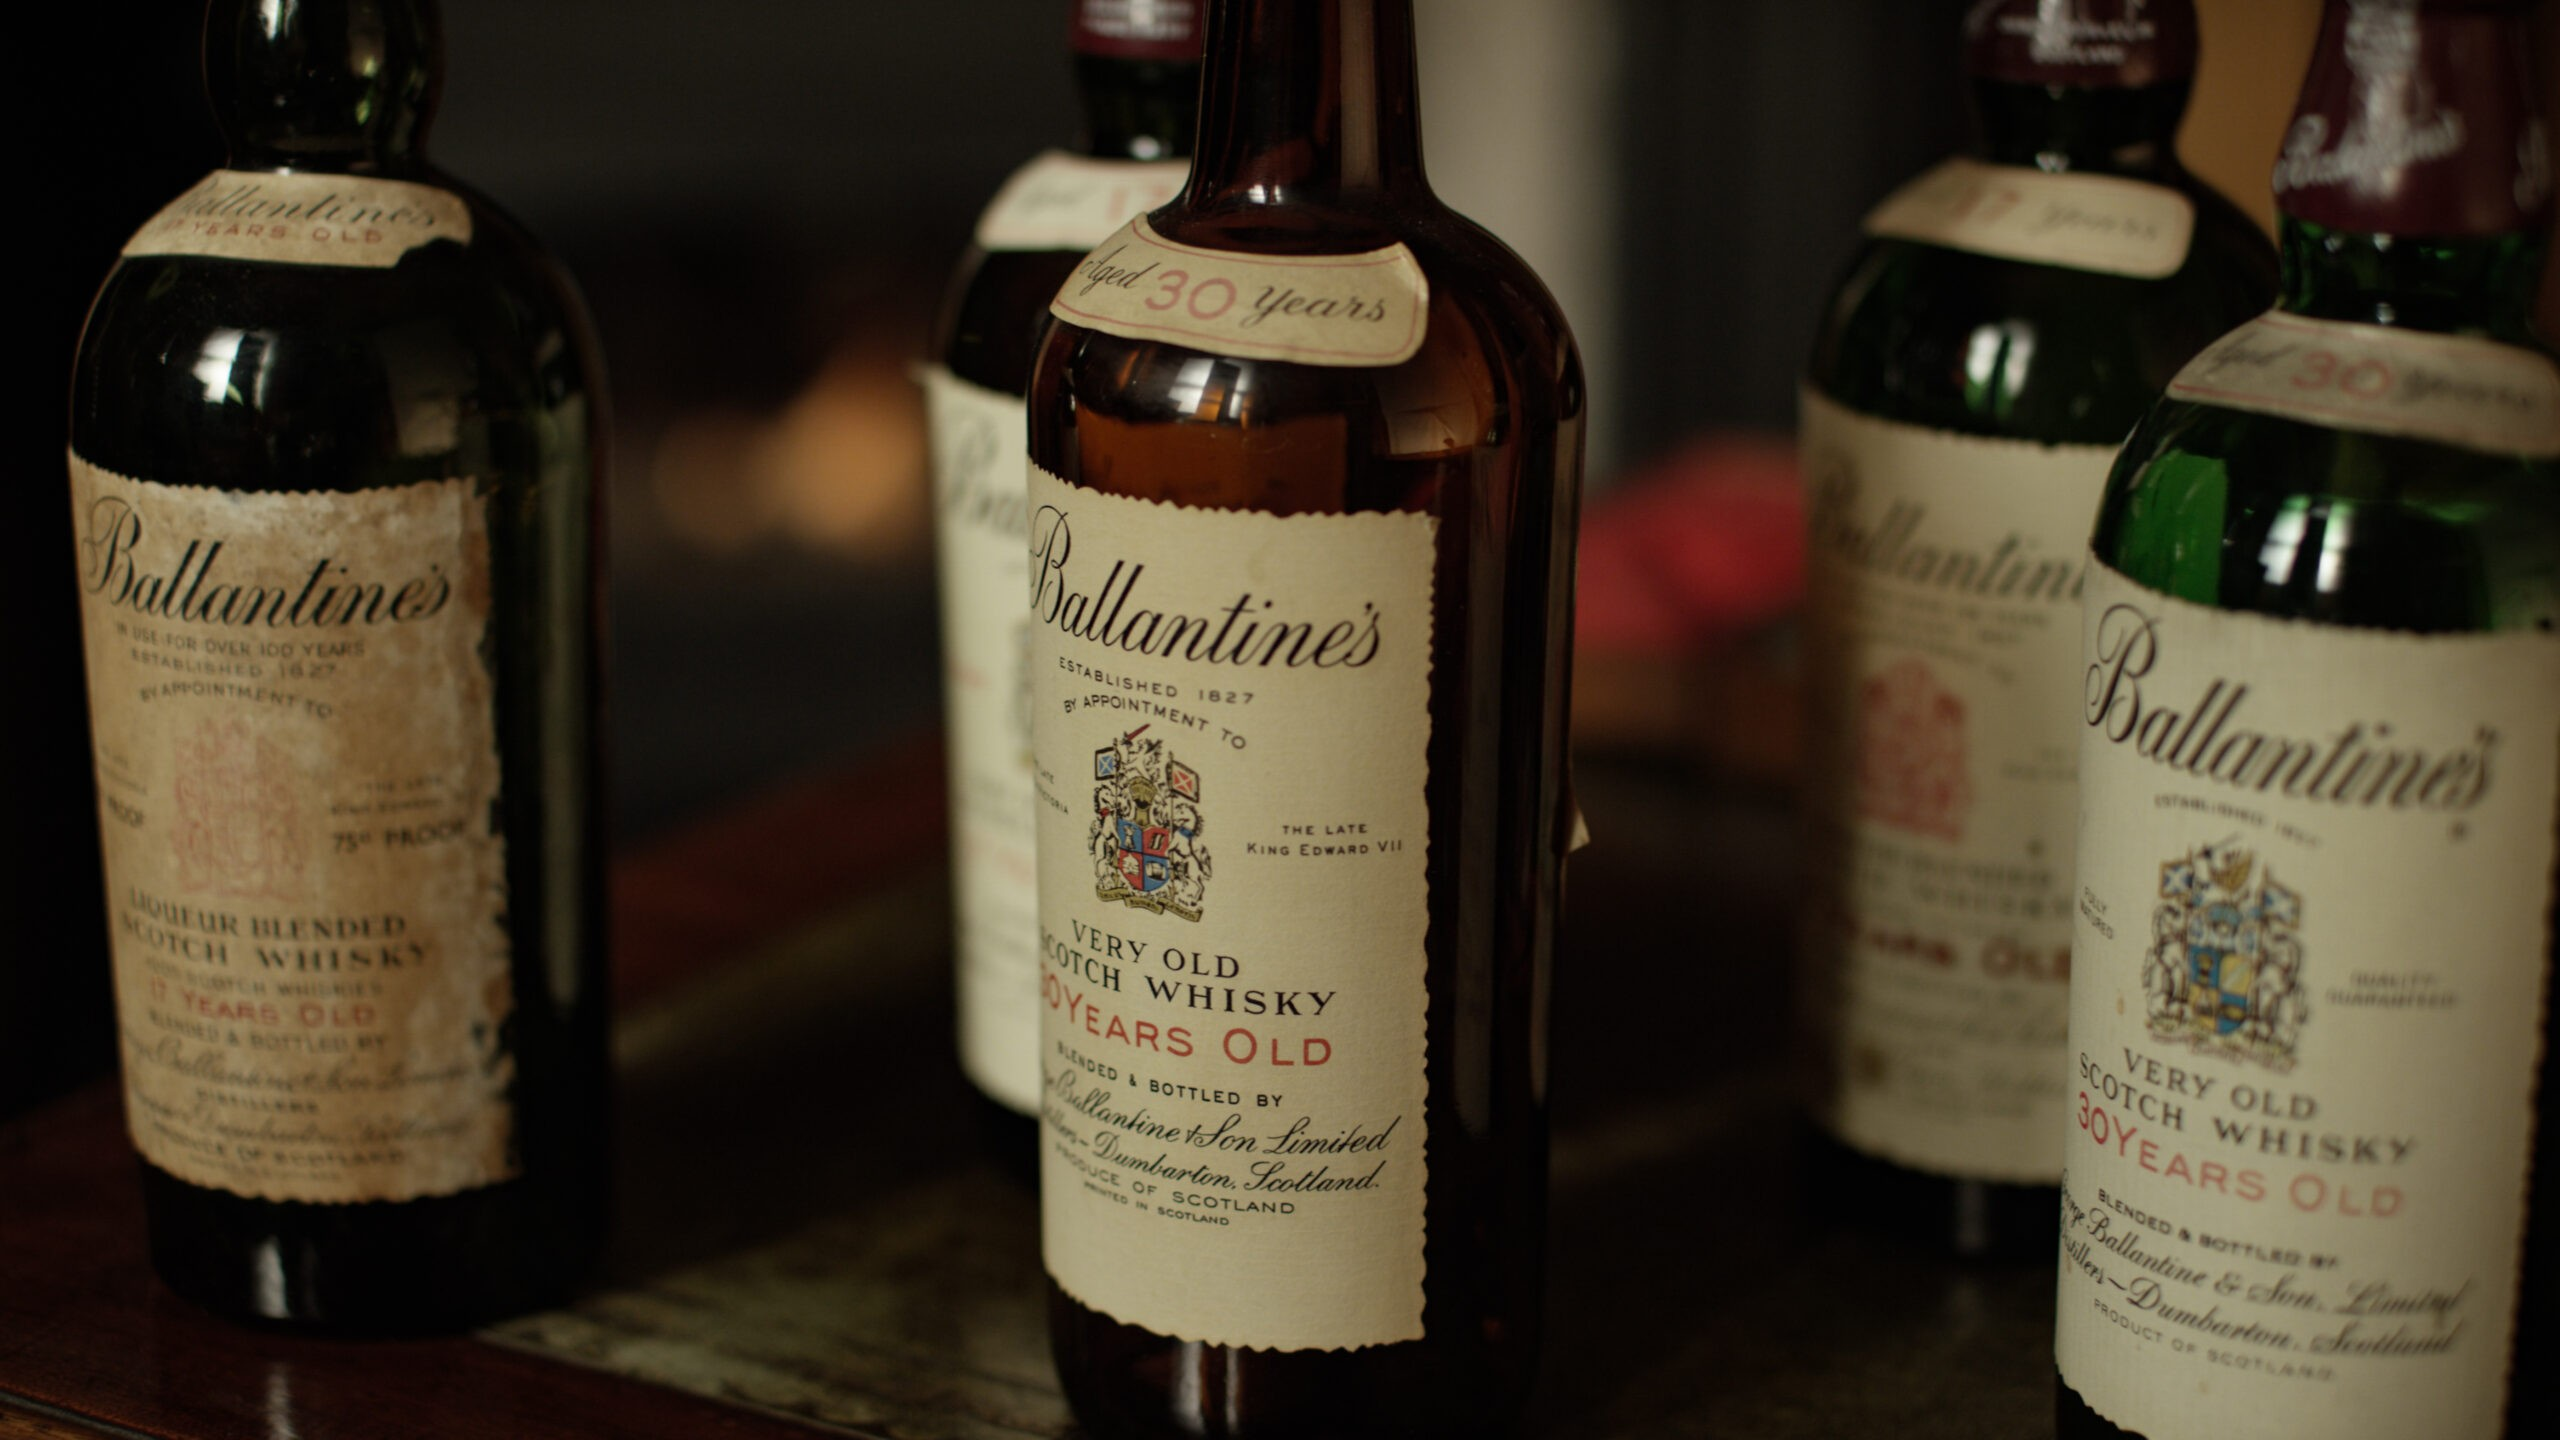 ballantines bottles